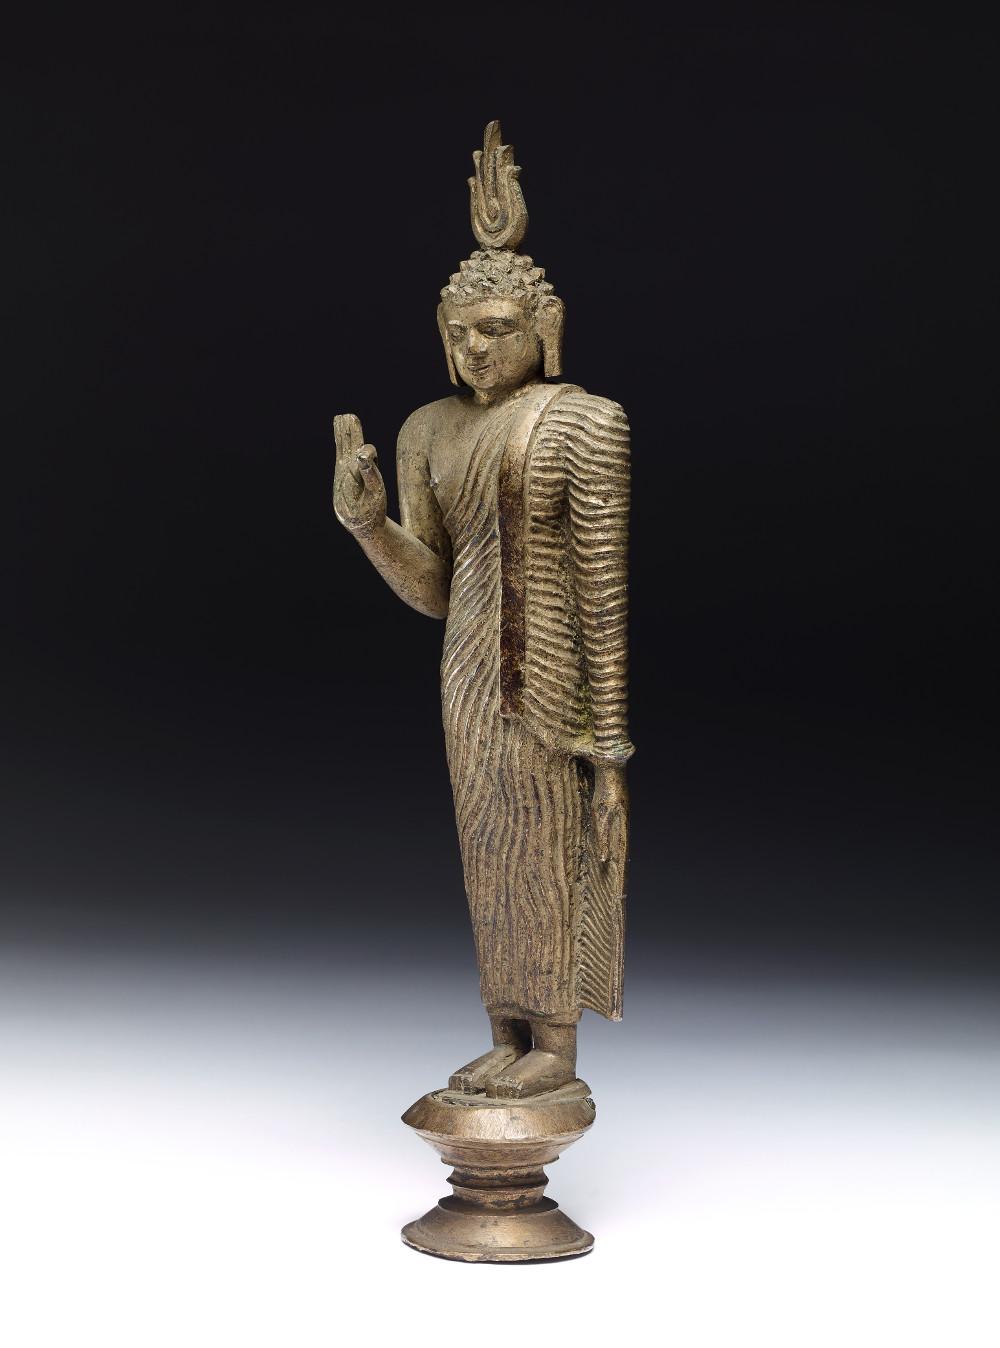 Buddha - BronzeAD 1800–1900Sri LankaBritish Museum